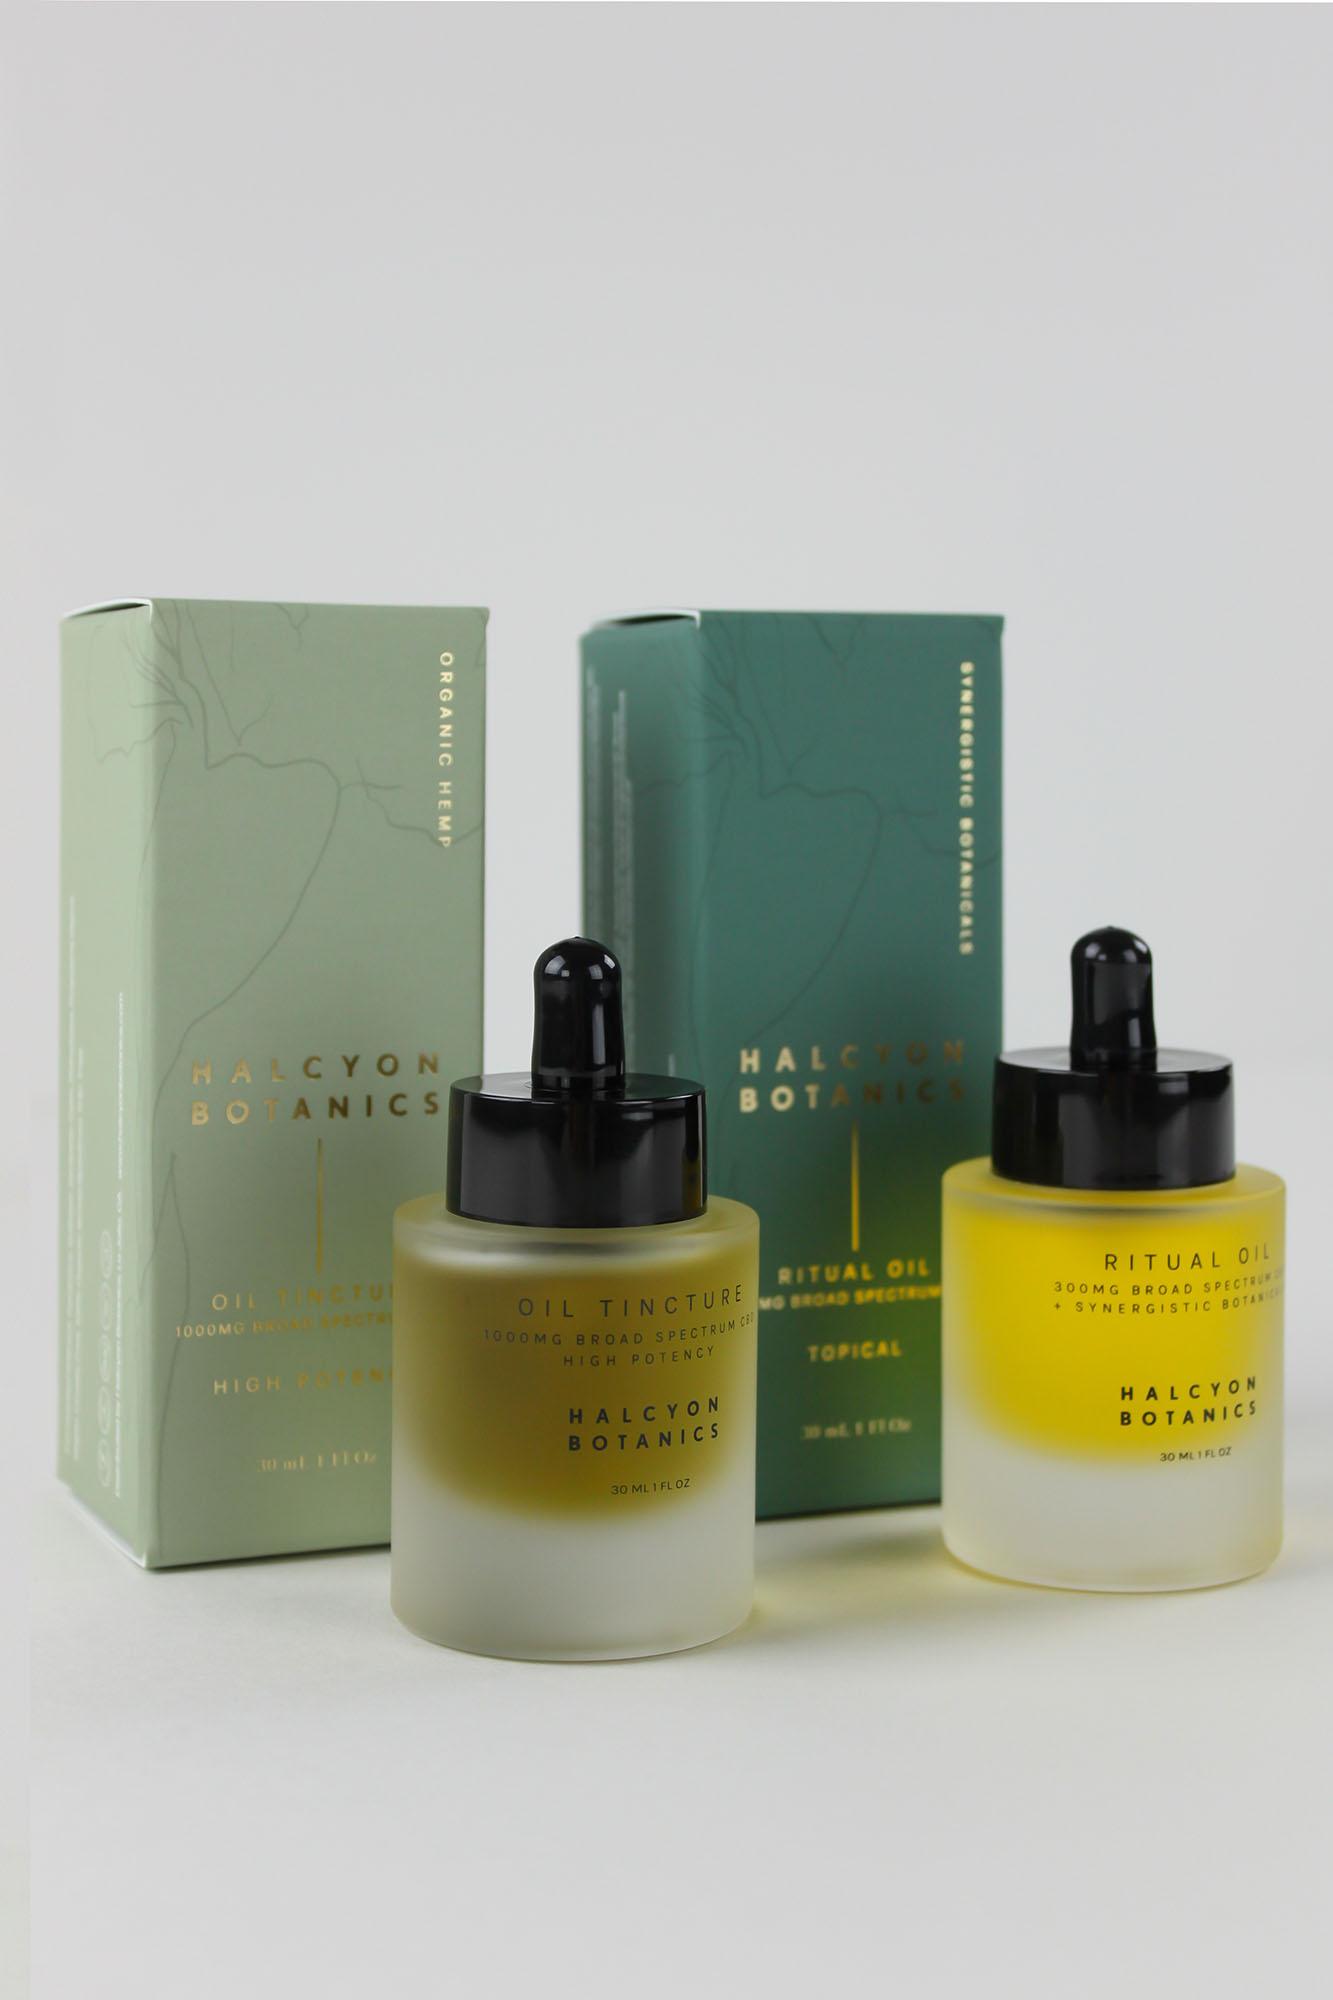 Custom Chipboard Product Box and Custom Printed Bottles l Halcyon Botanics